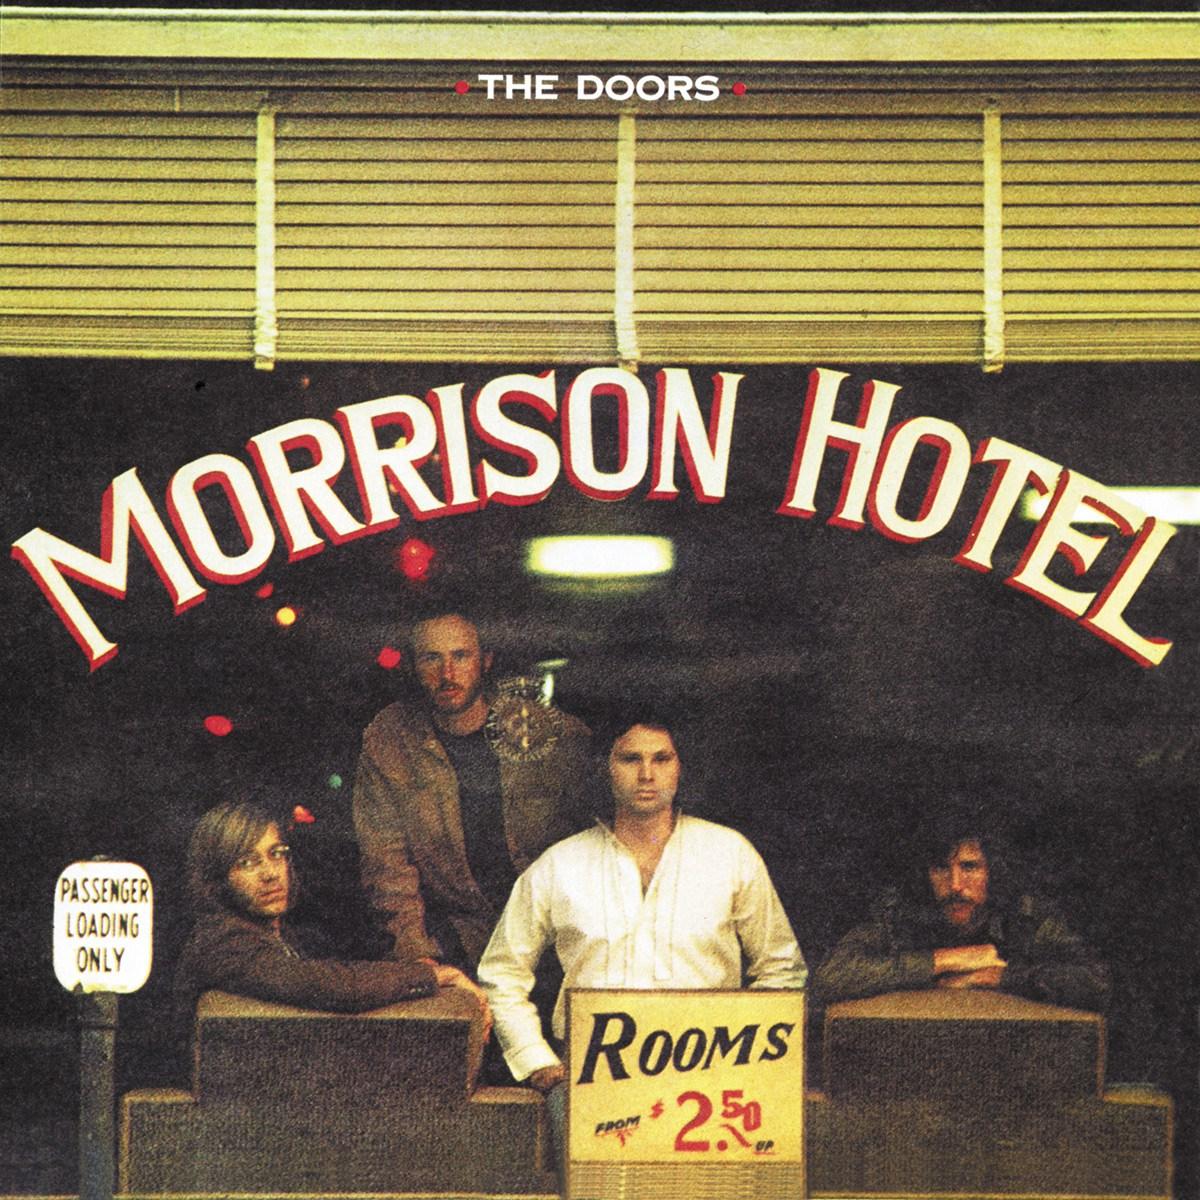 Morrison Hotel SACD